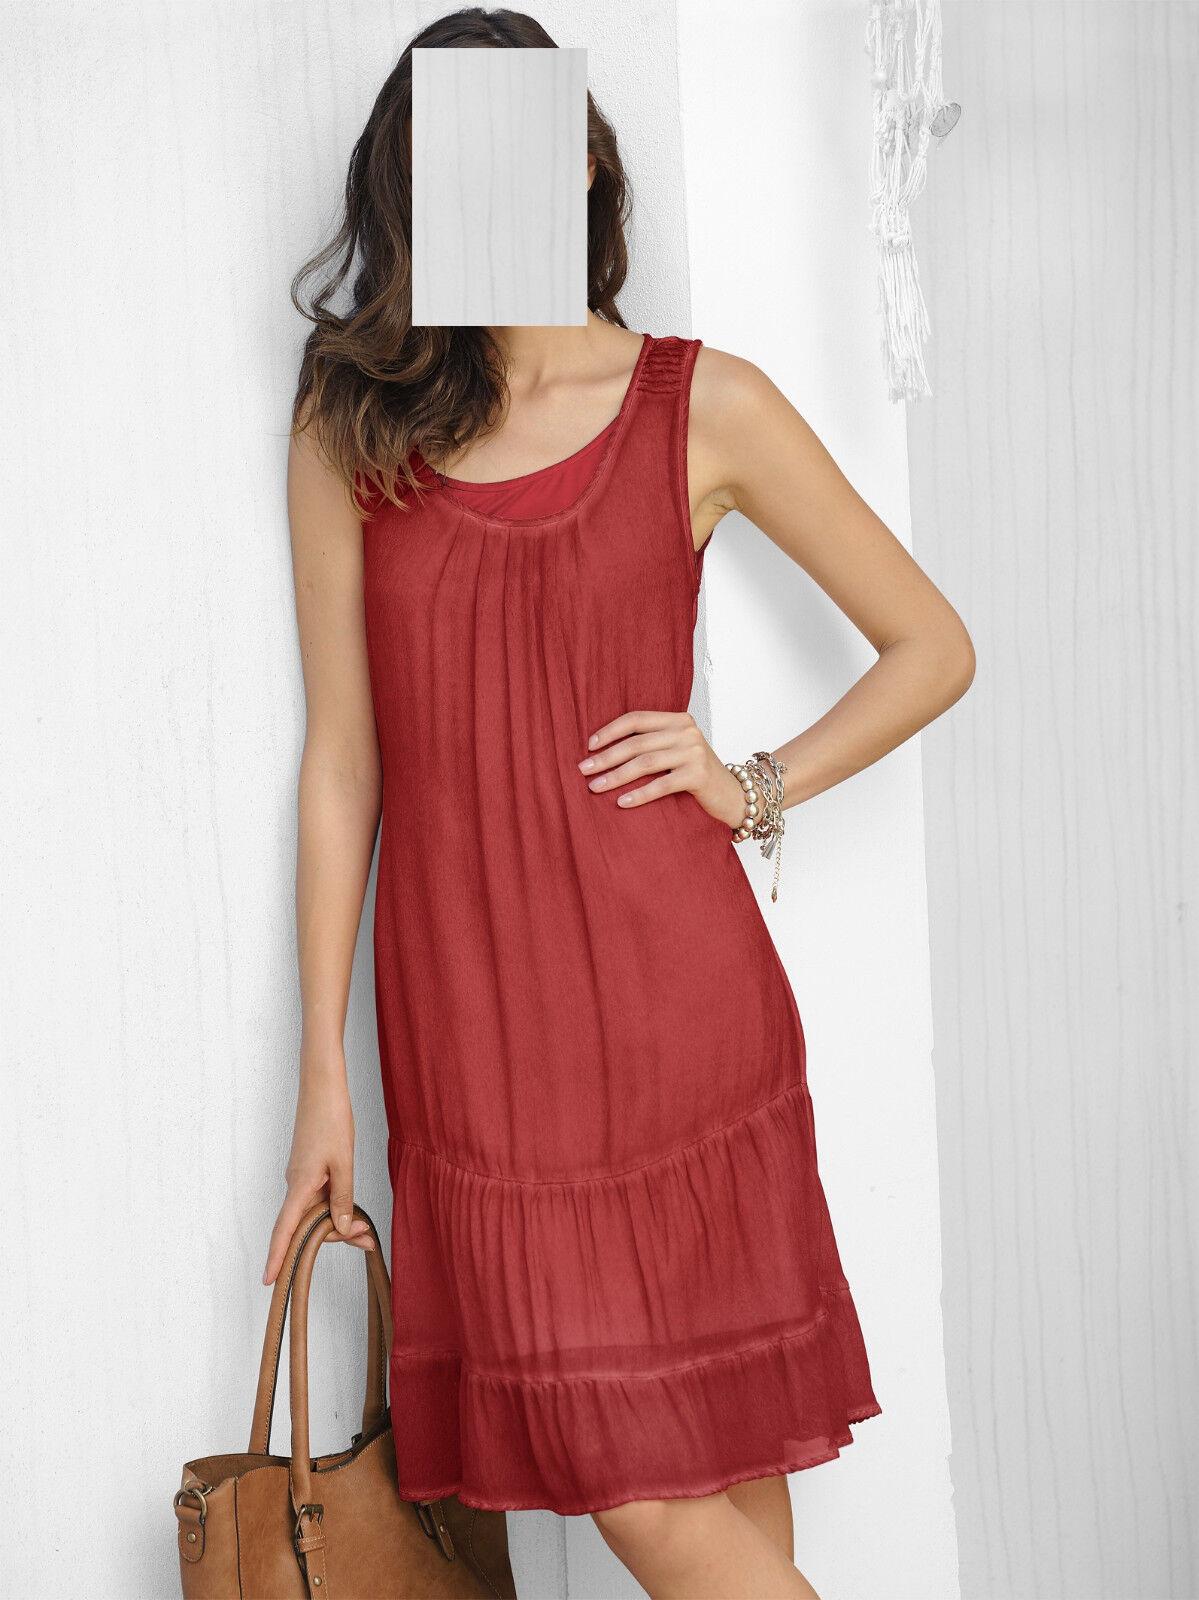 Marken Layering Kleid 2 in 1 burnedrot  Gr. 42 0518149664